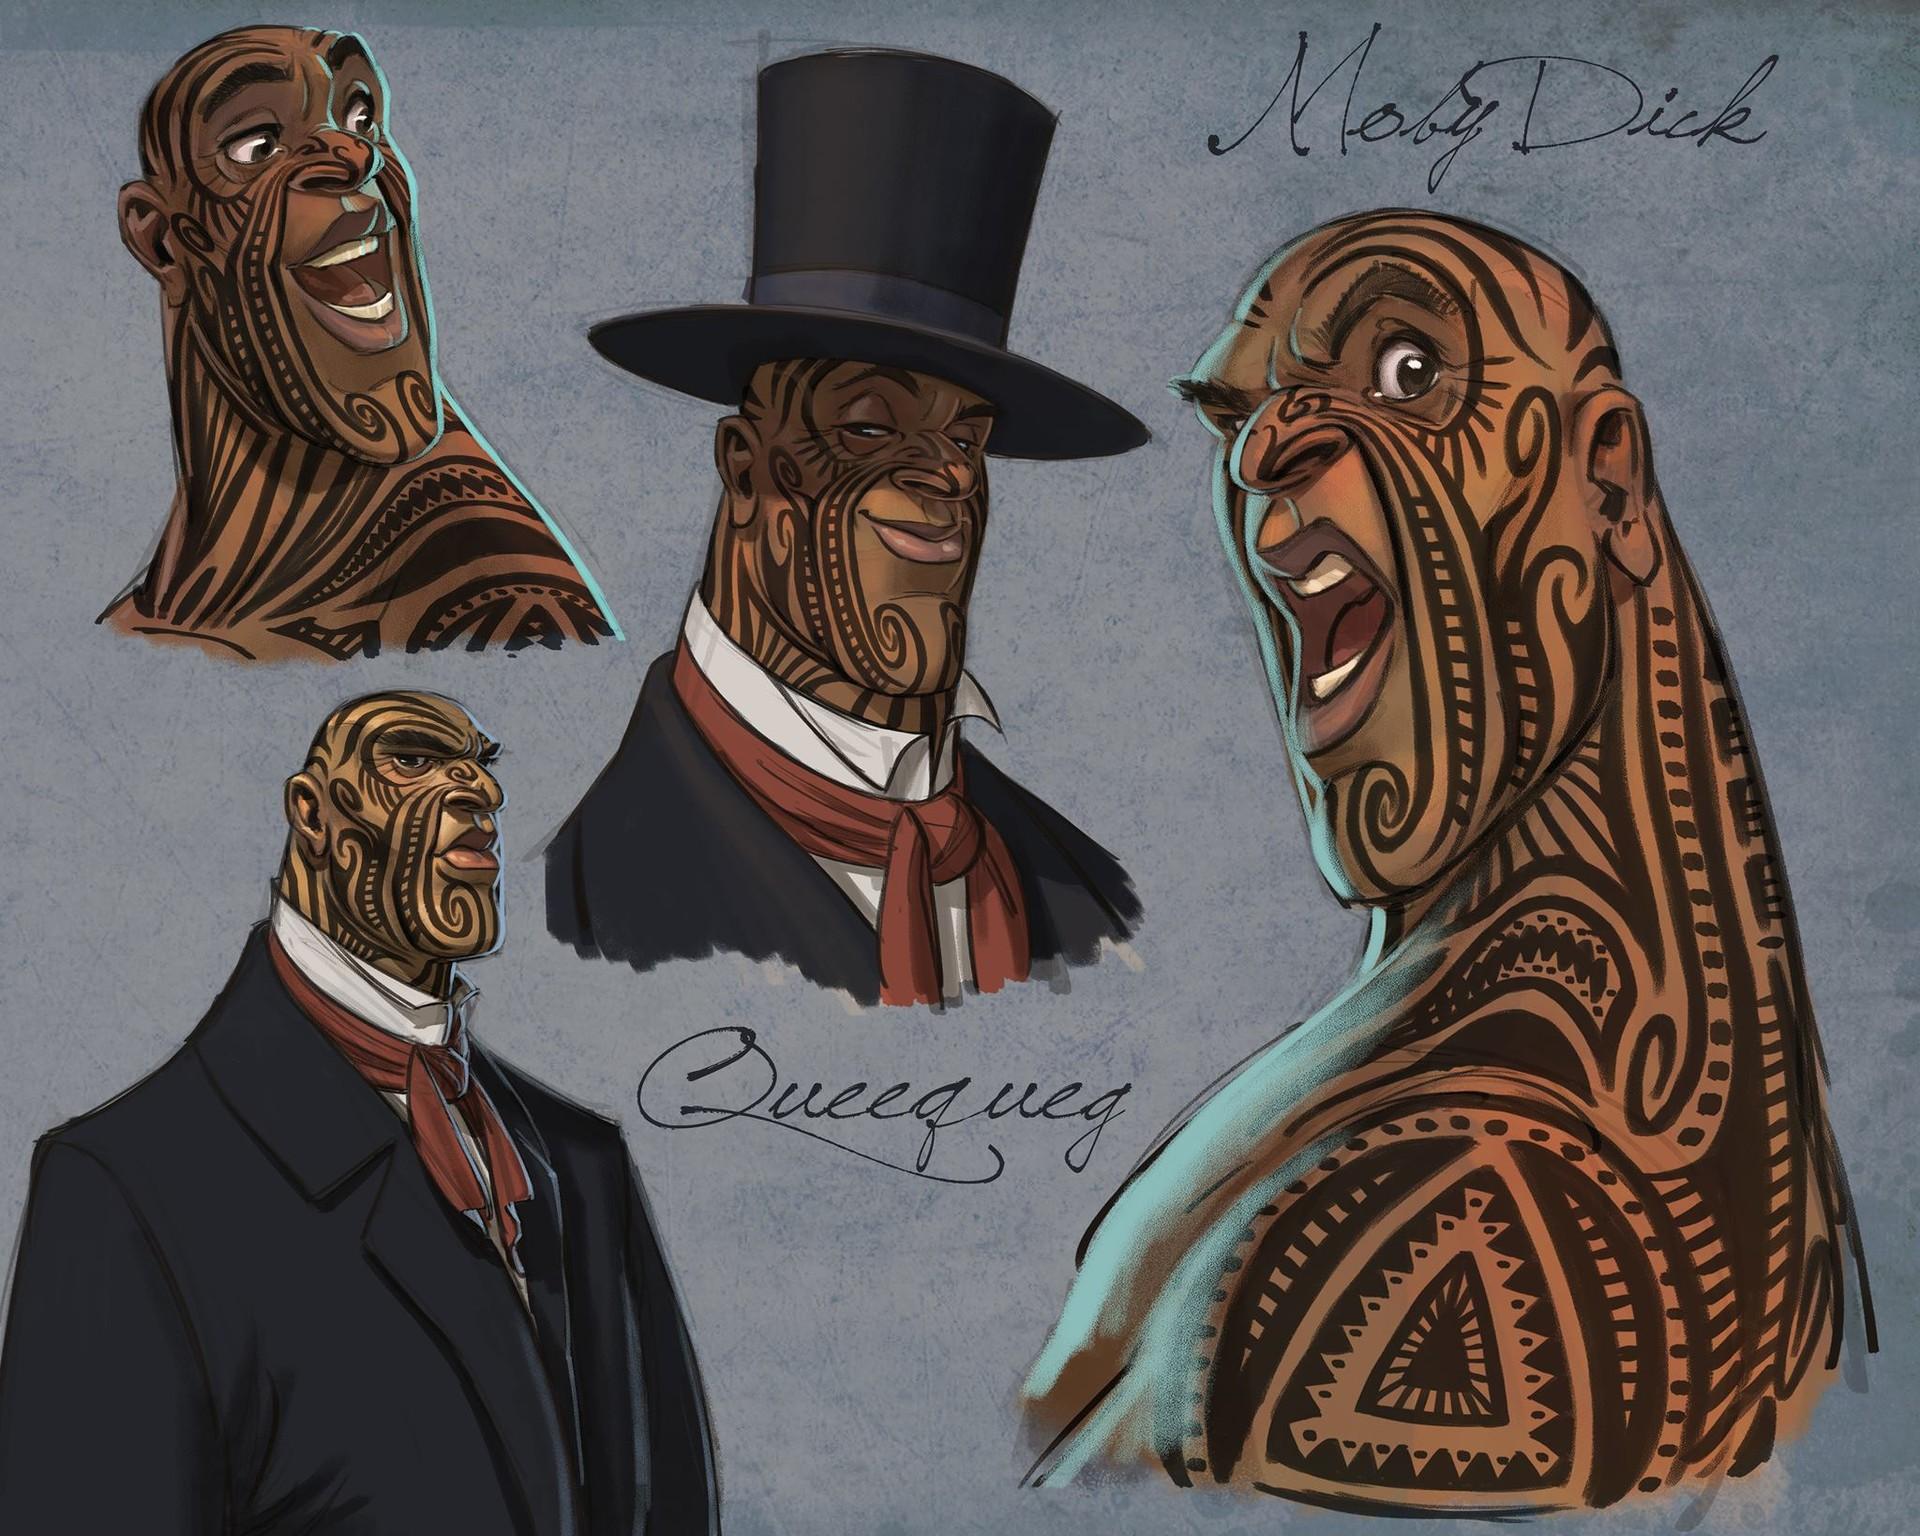 Character Design By Aaron Blaise : Artstation moby dick character designs aaron blaise